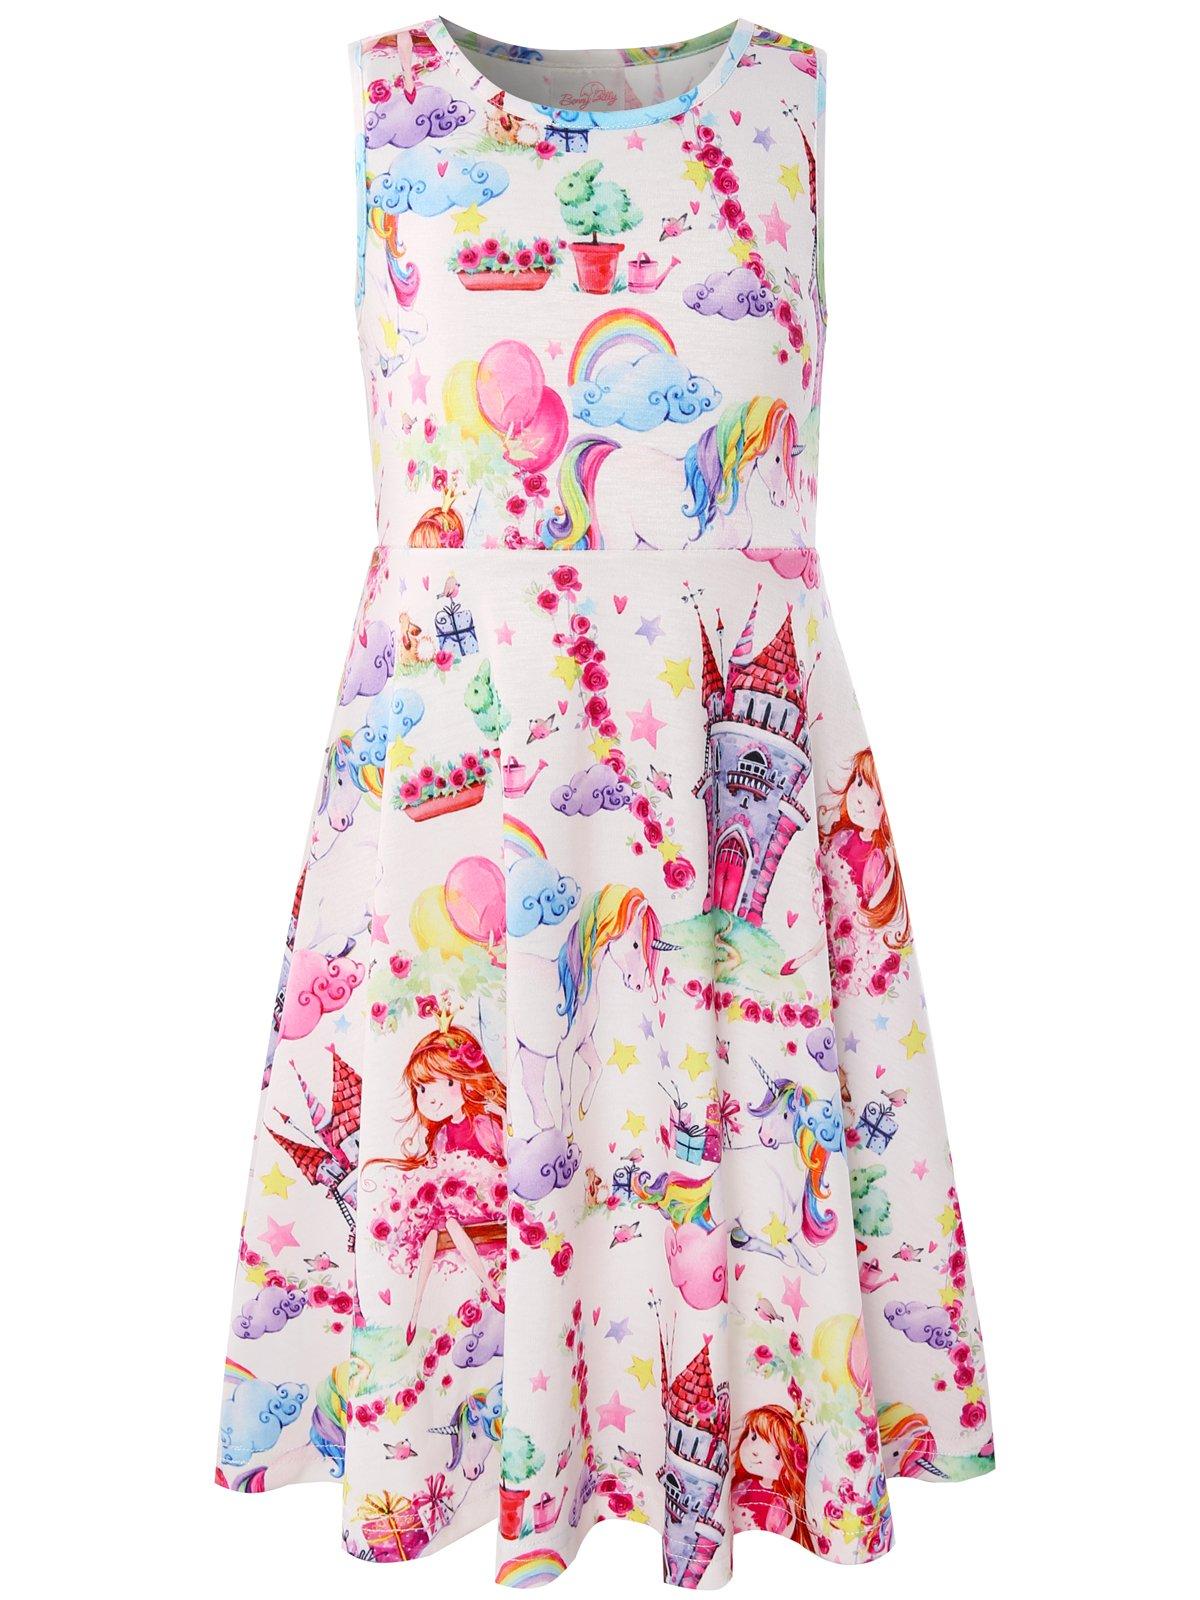 Bonny Billy Little Girls Dress Castle Party Casual Midi Kids Clothing Size 7-8 White